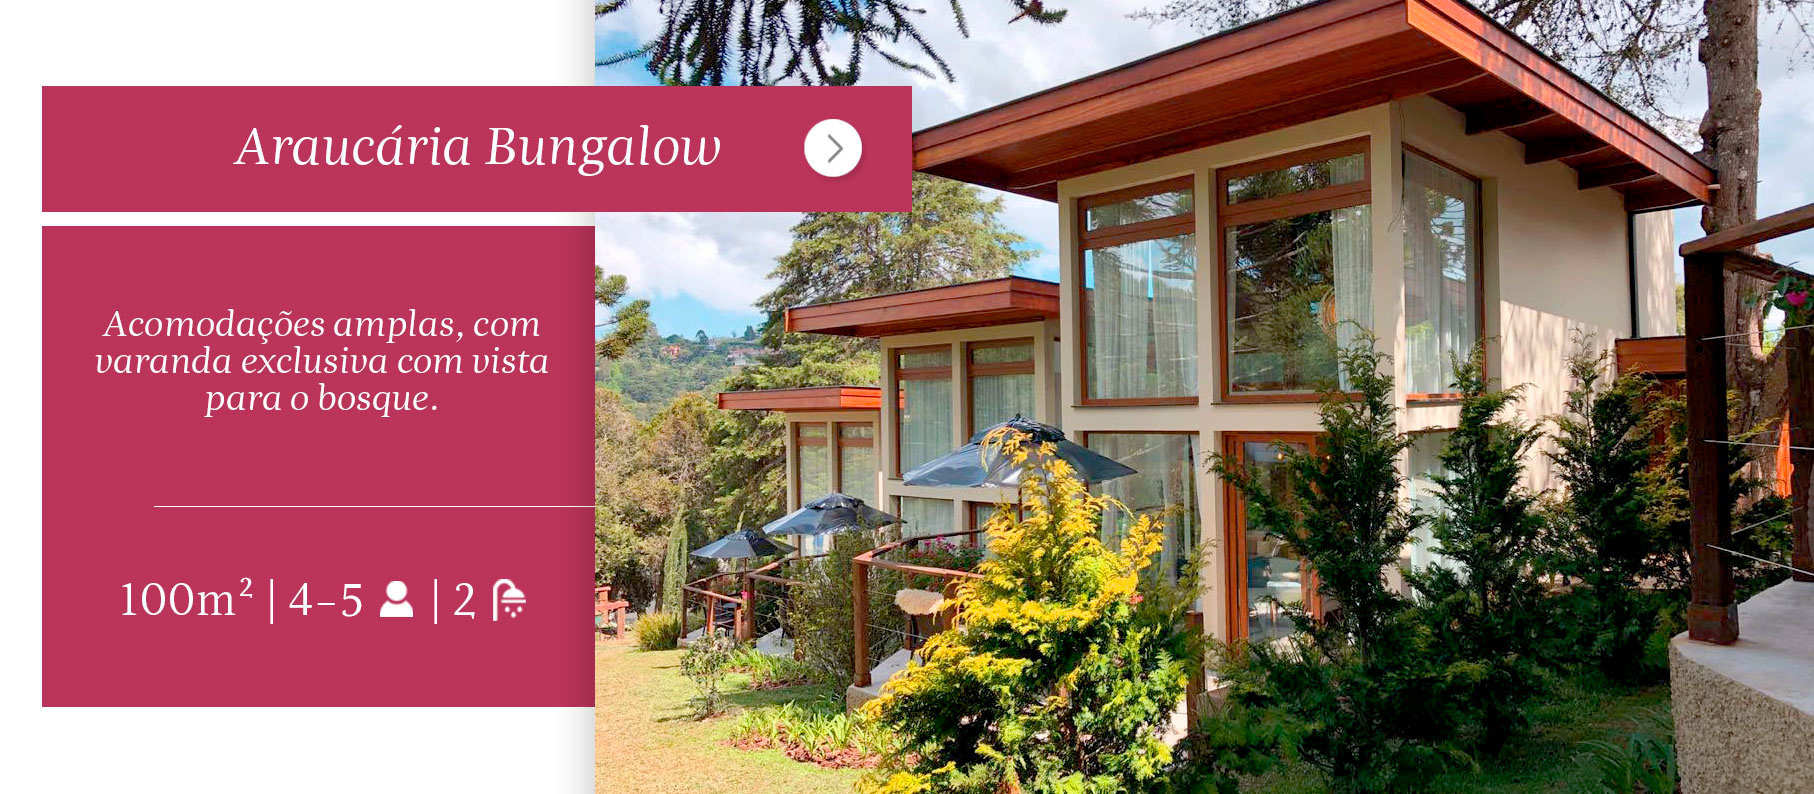 Bangalow Hotel Quebra-Noz